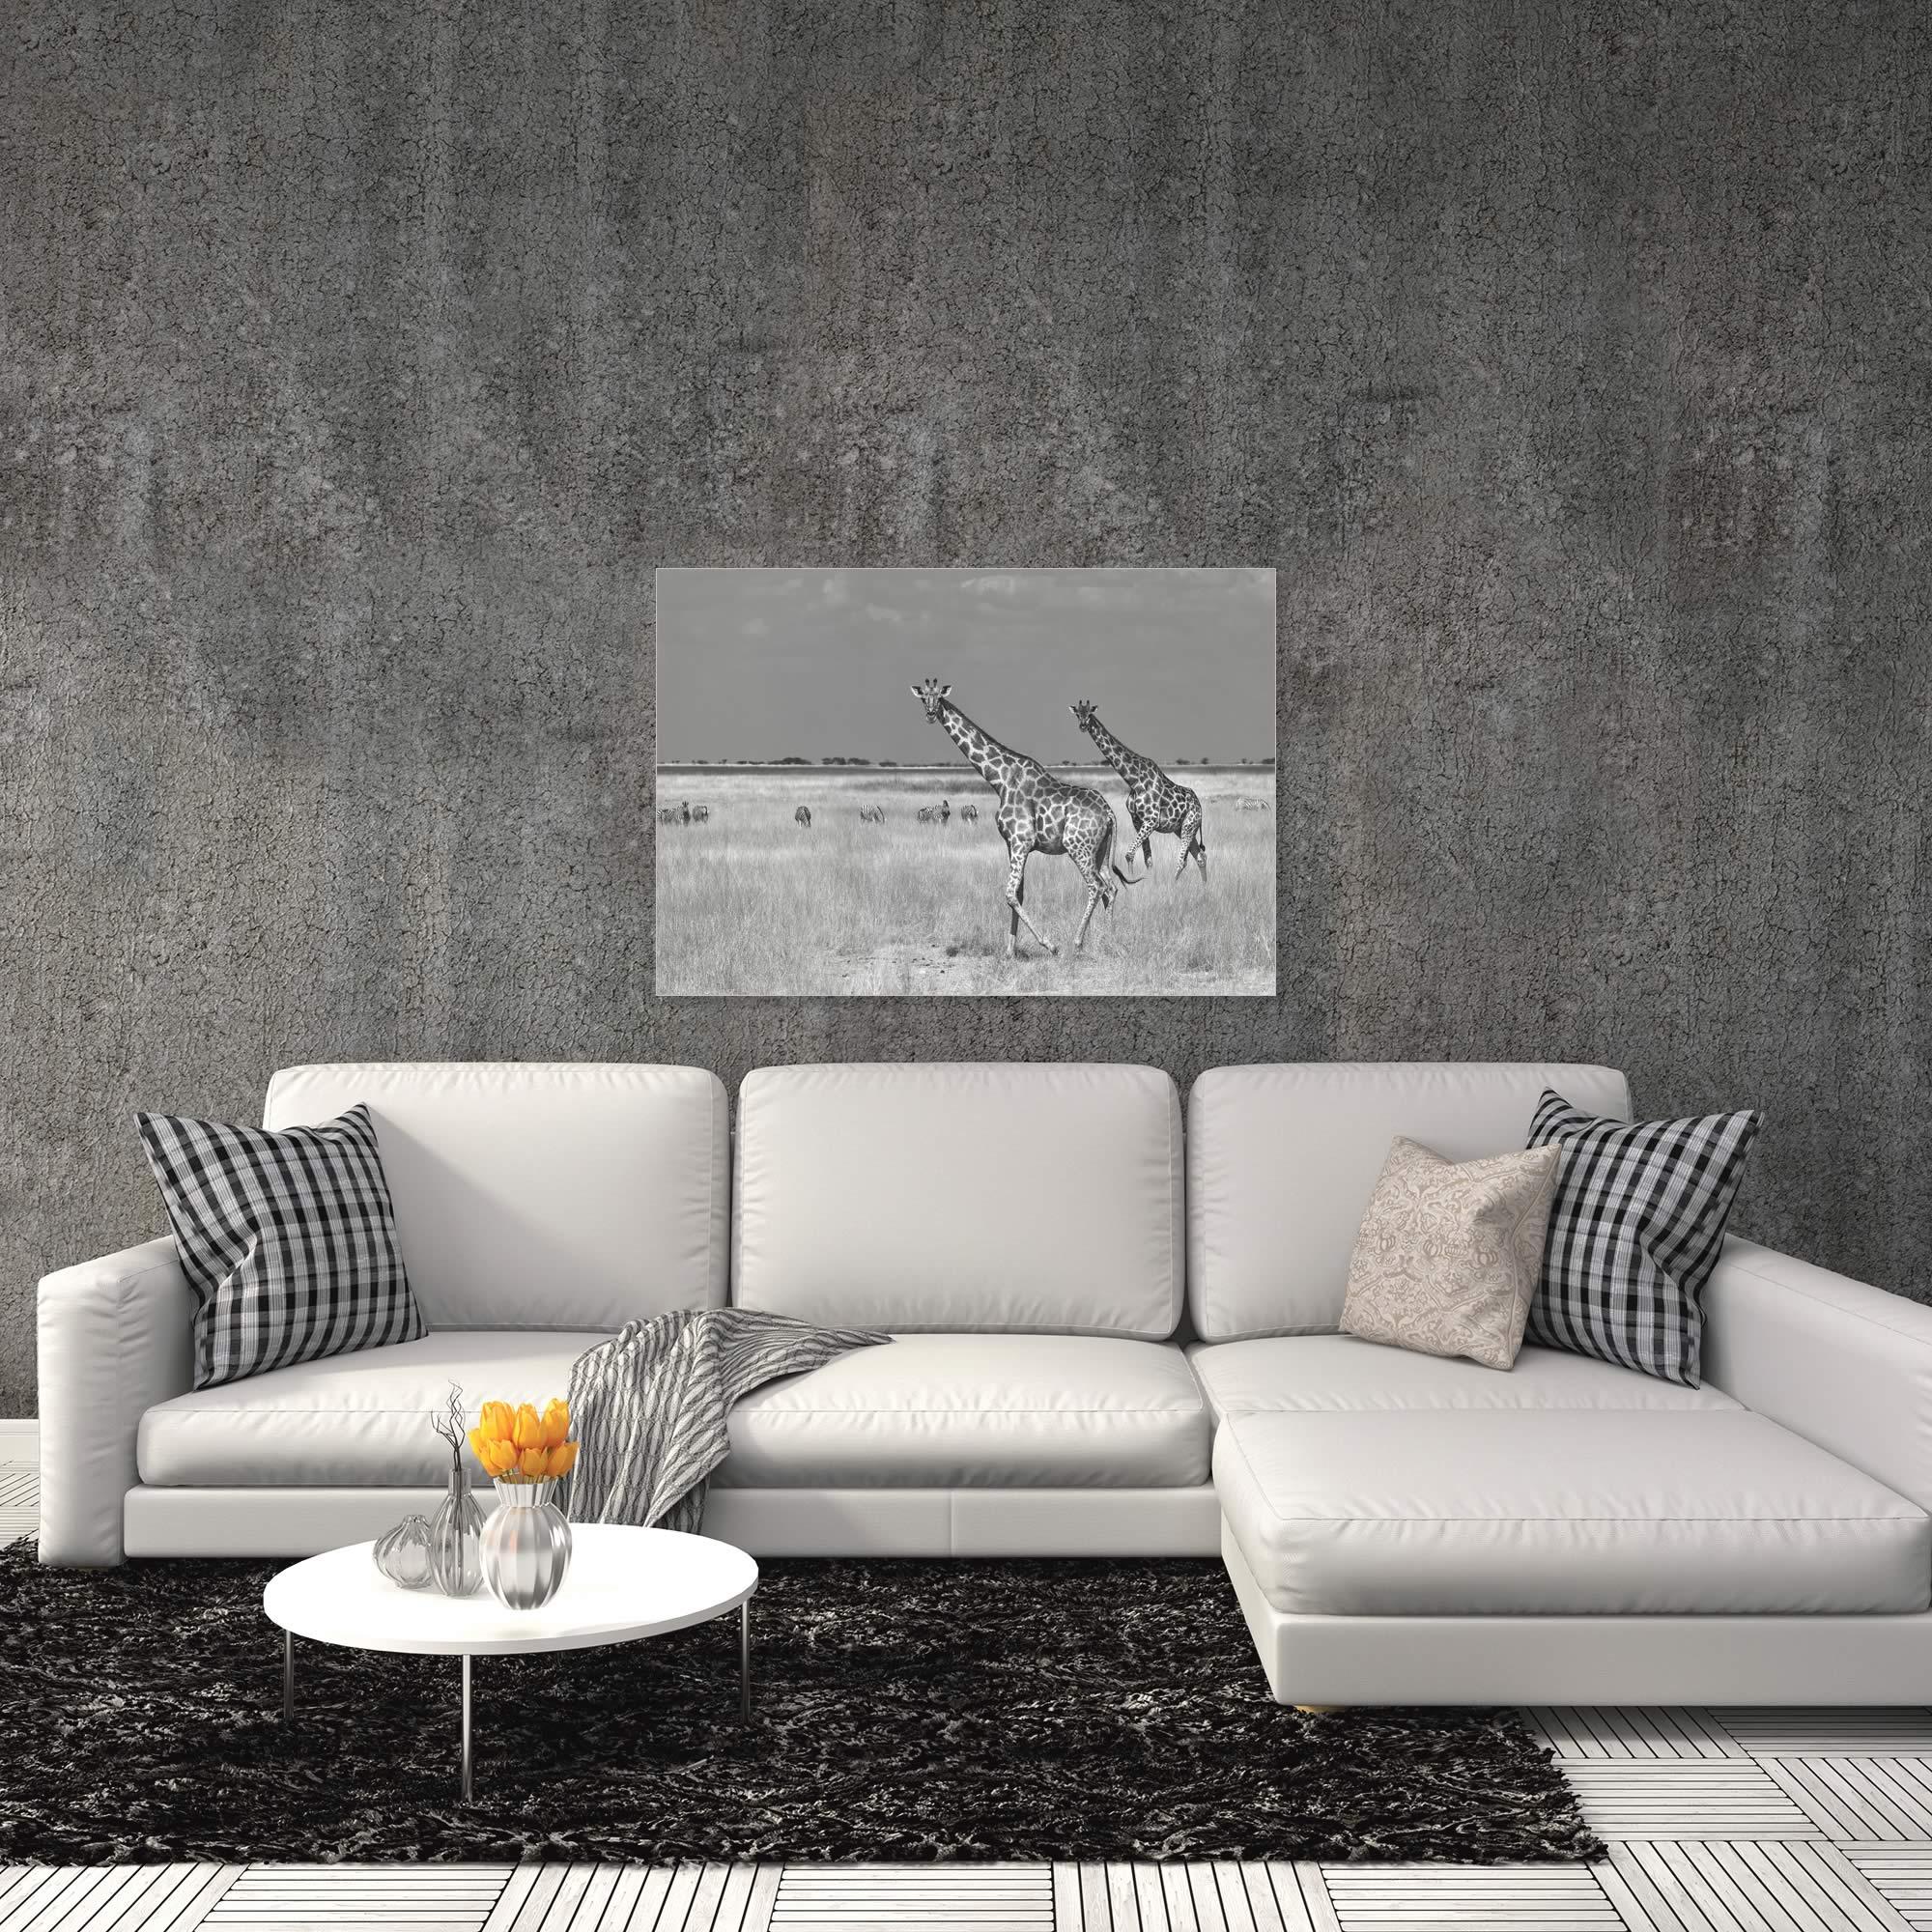 Savanna Favorites by Mathilde Guillemot - Giraffe and Zebra Art on Metal or Acrylic - Alternate View 1